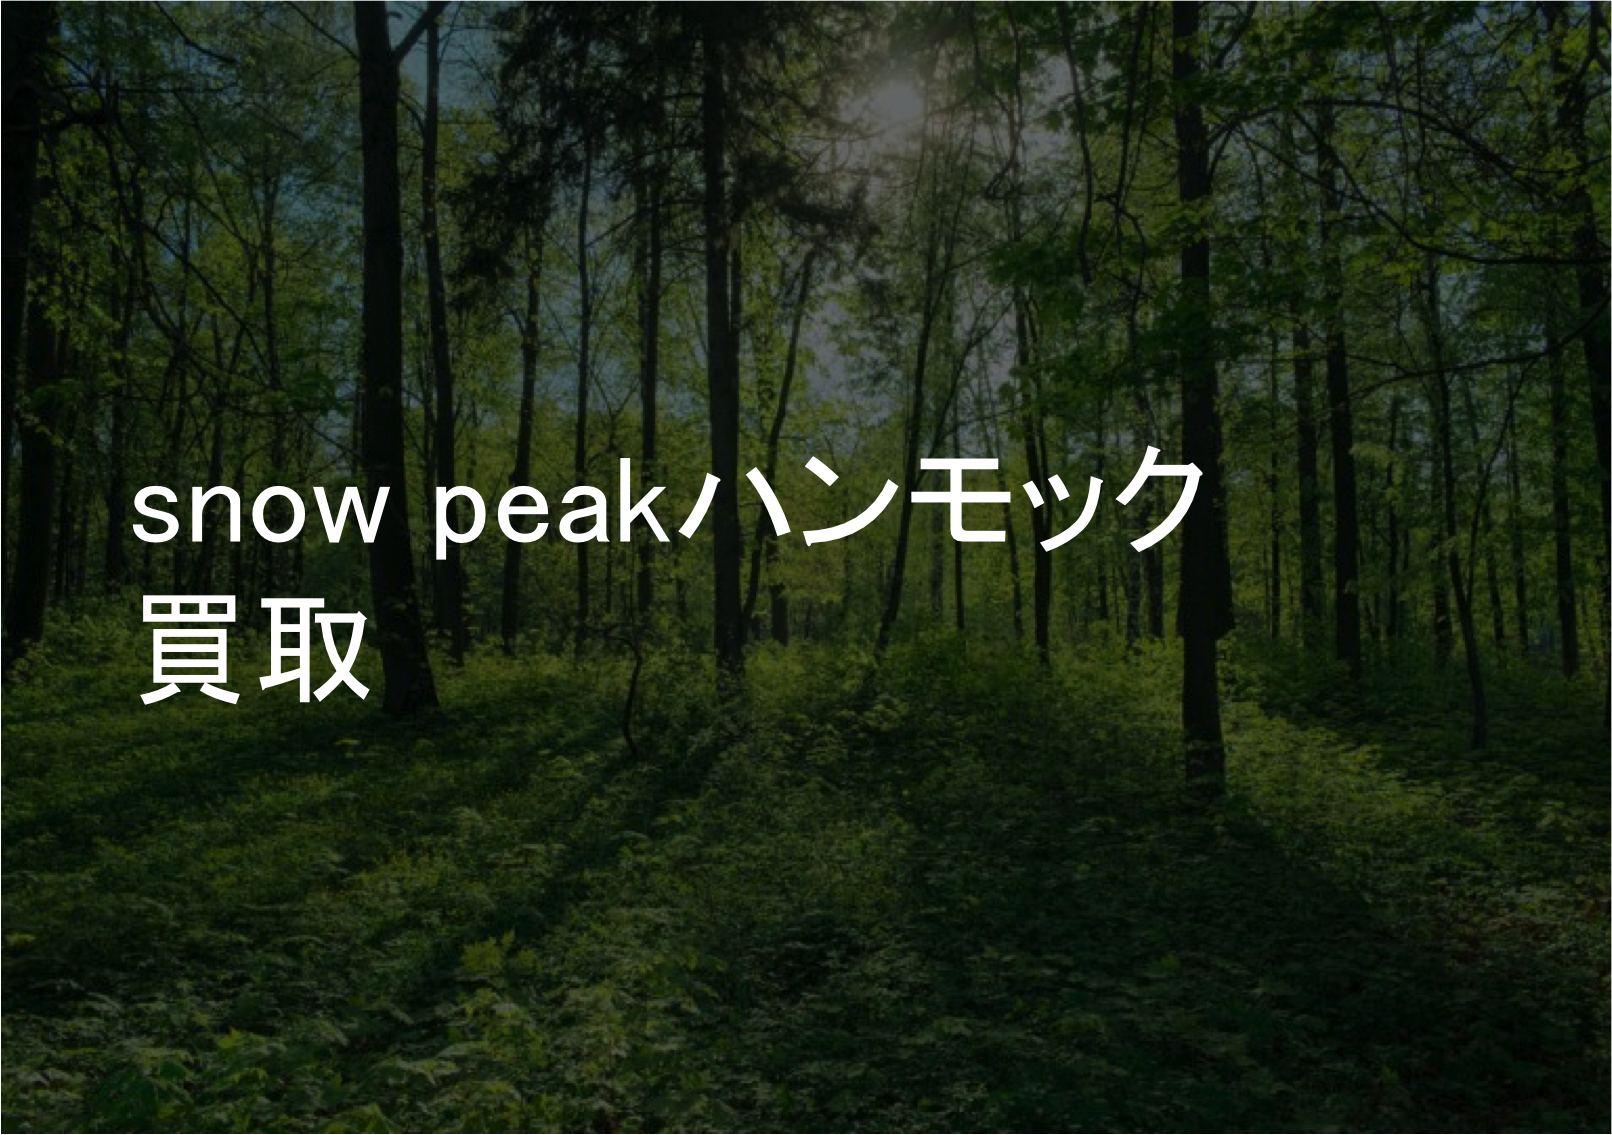 snow peak ハンモック買取なら